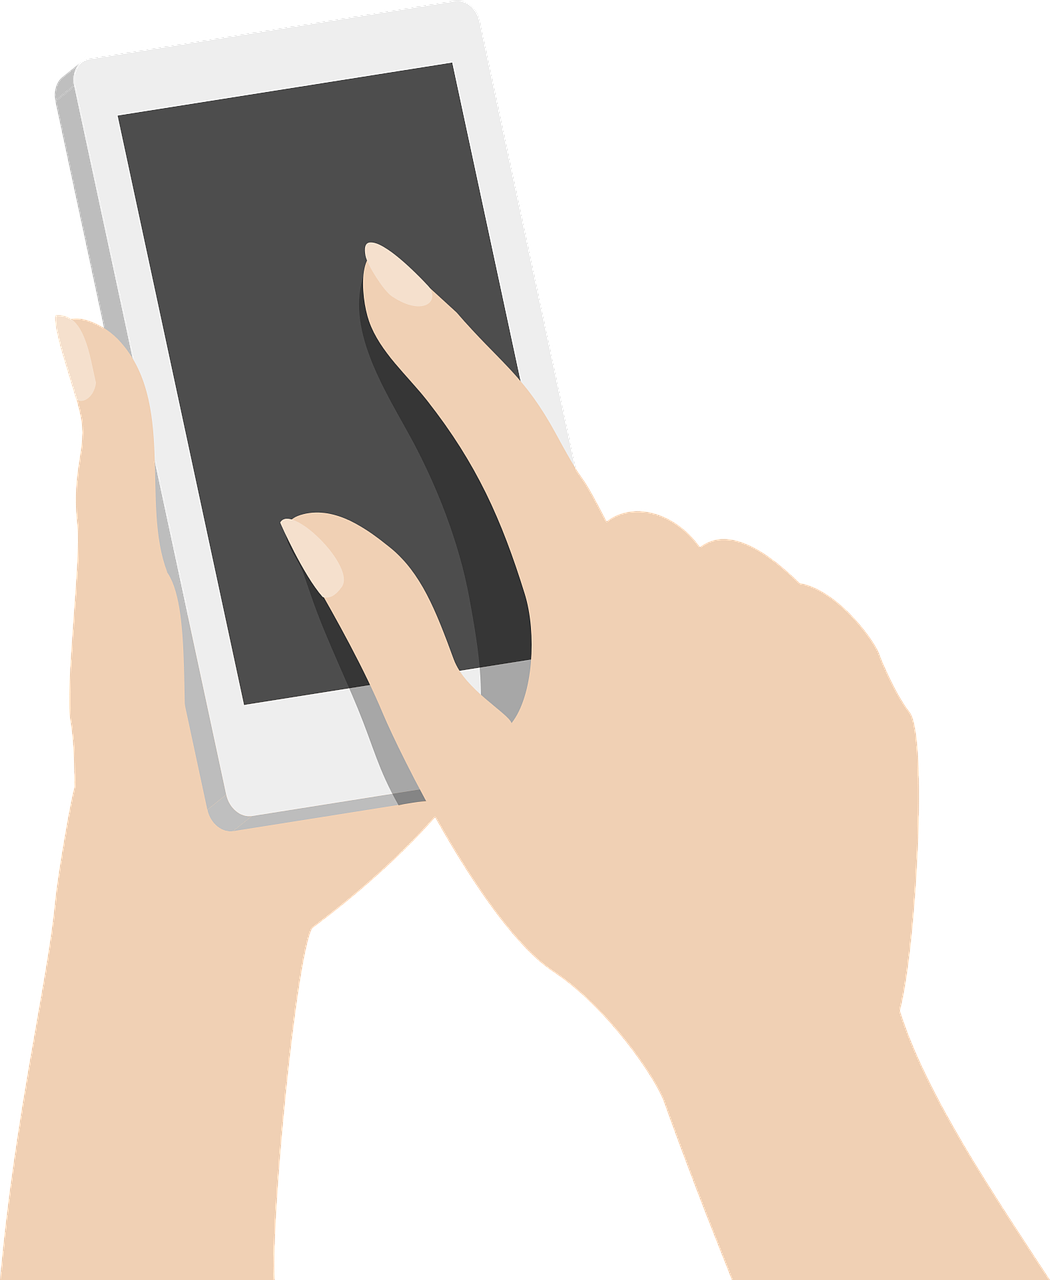 smartphone, phone, mobile